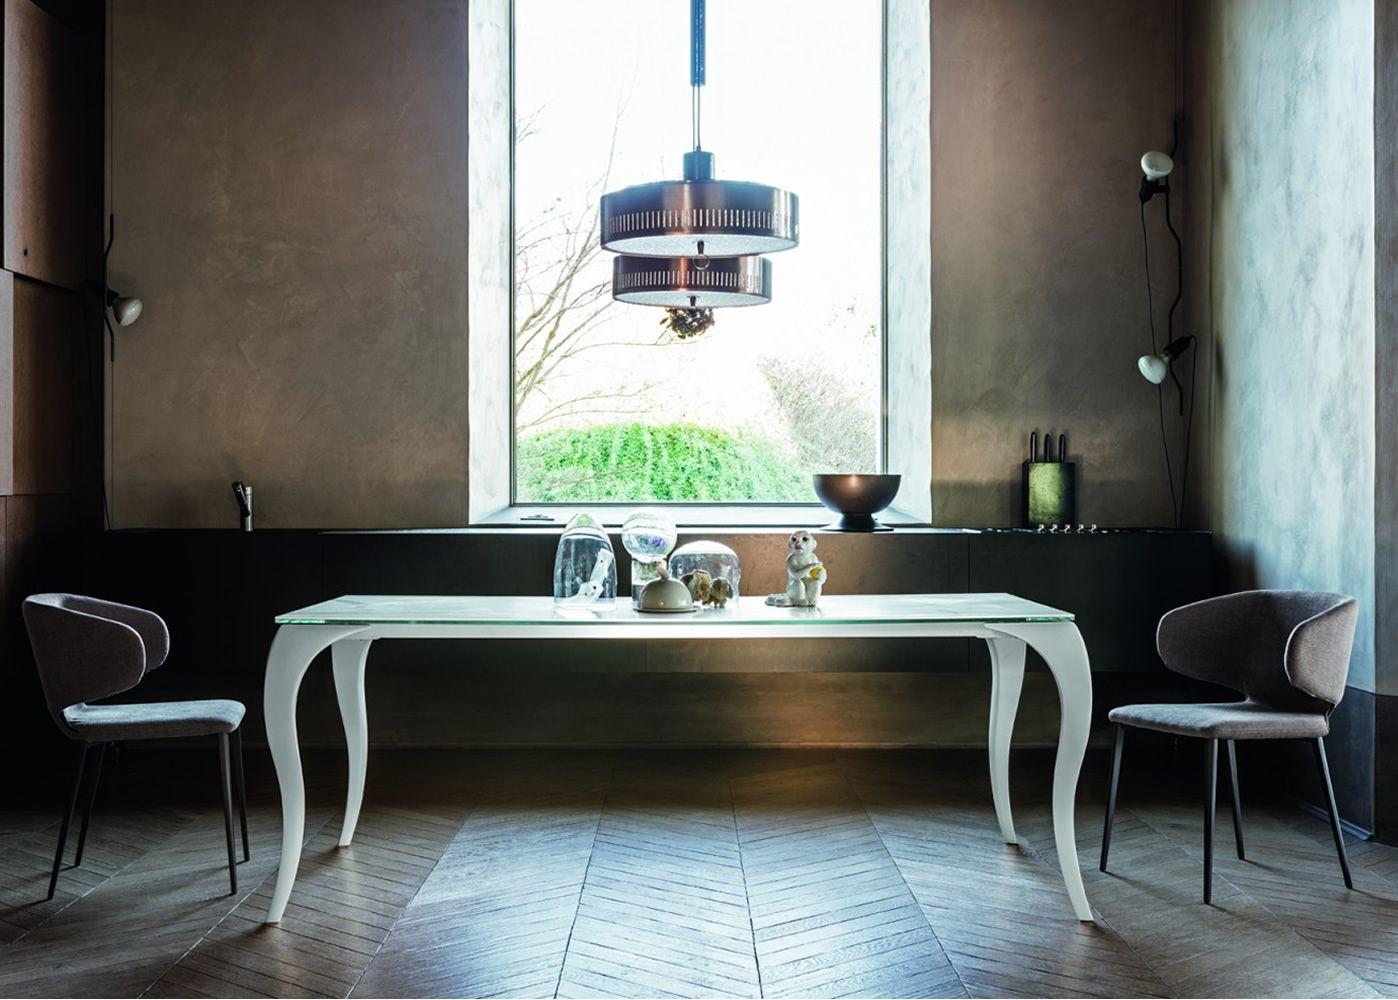 Bond tavolo fisso midj in policarbonato con piano vetro diverse misure sediarreda - Tavolo policarbonato ...